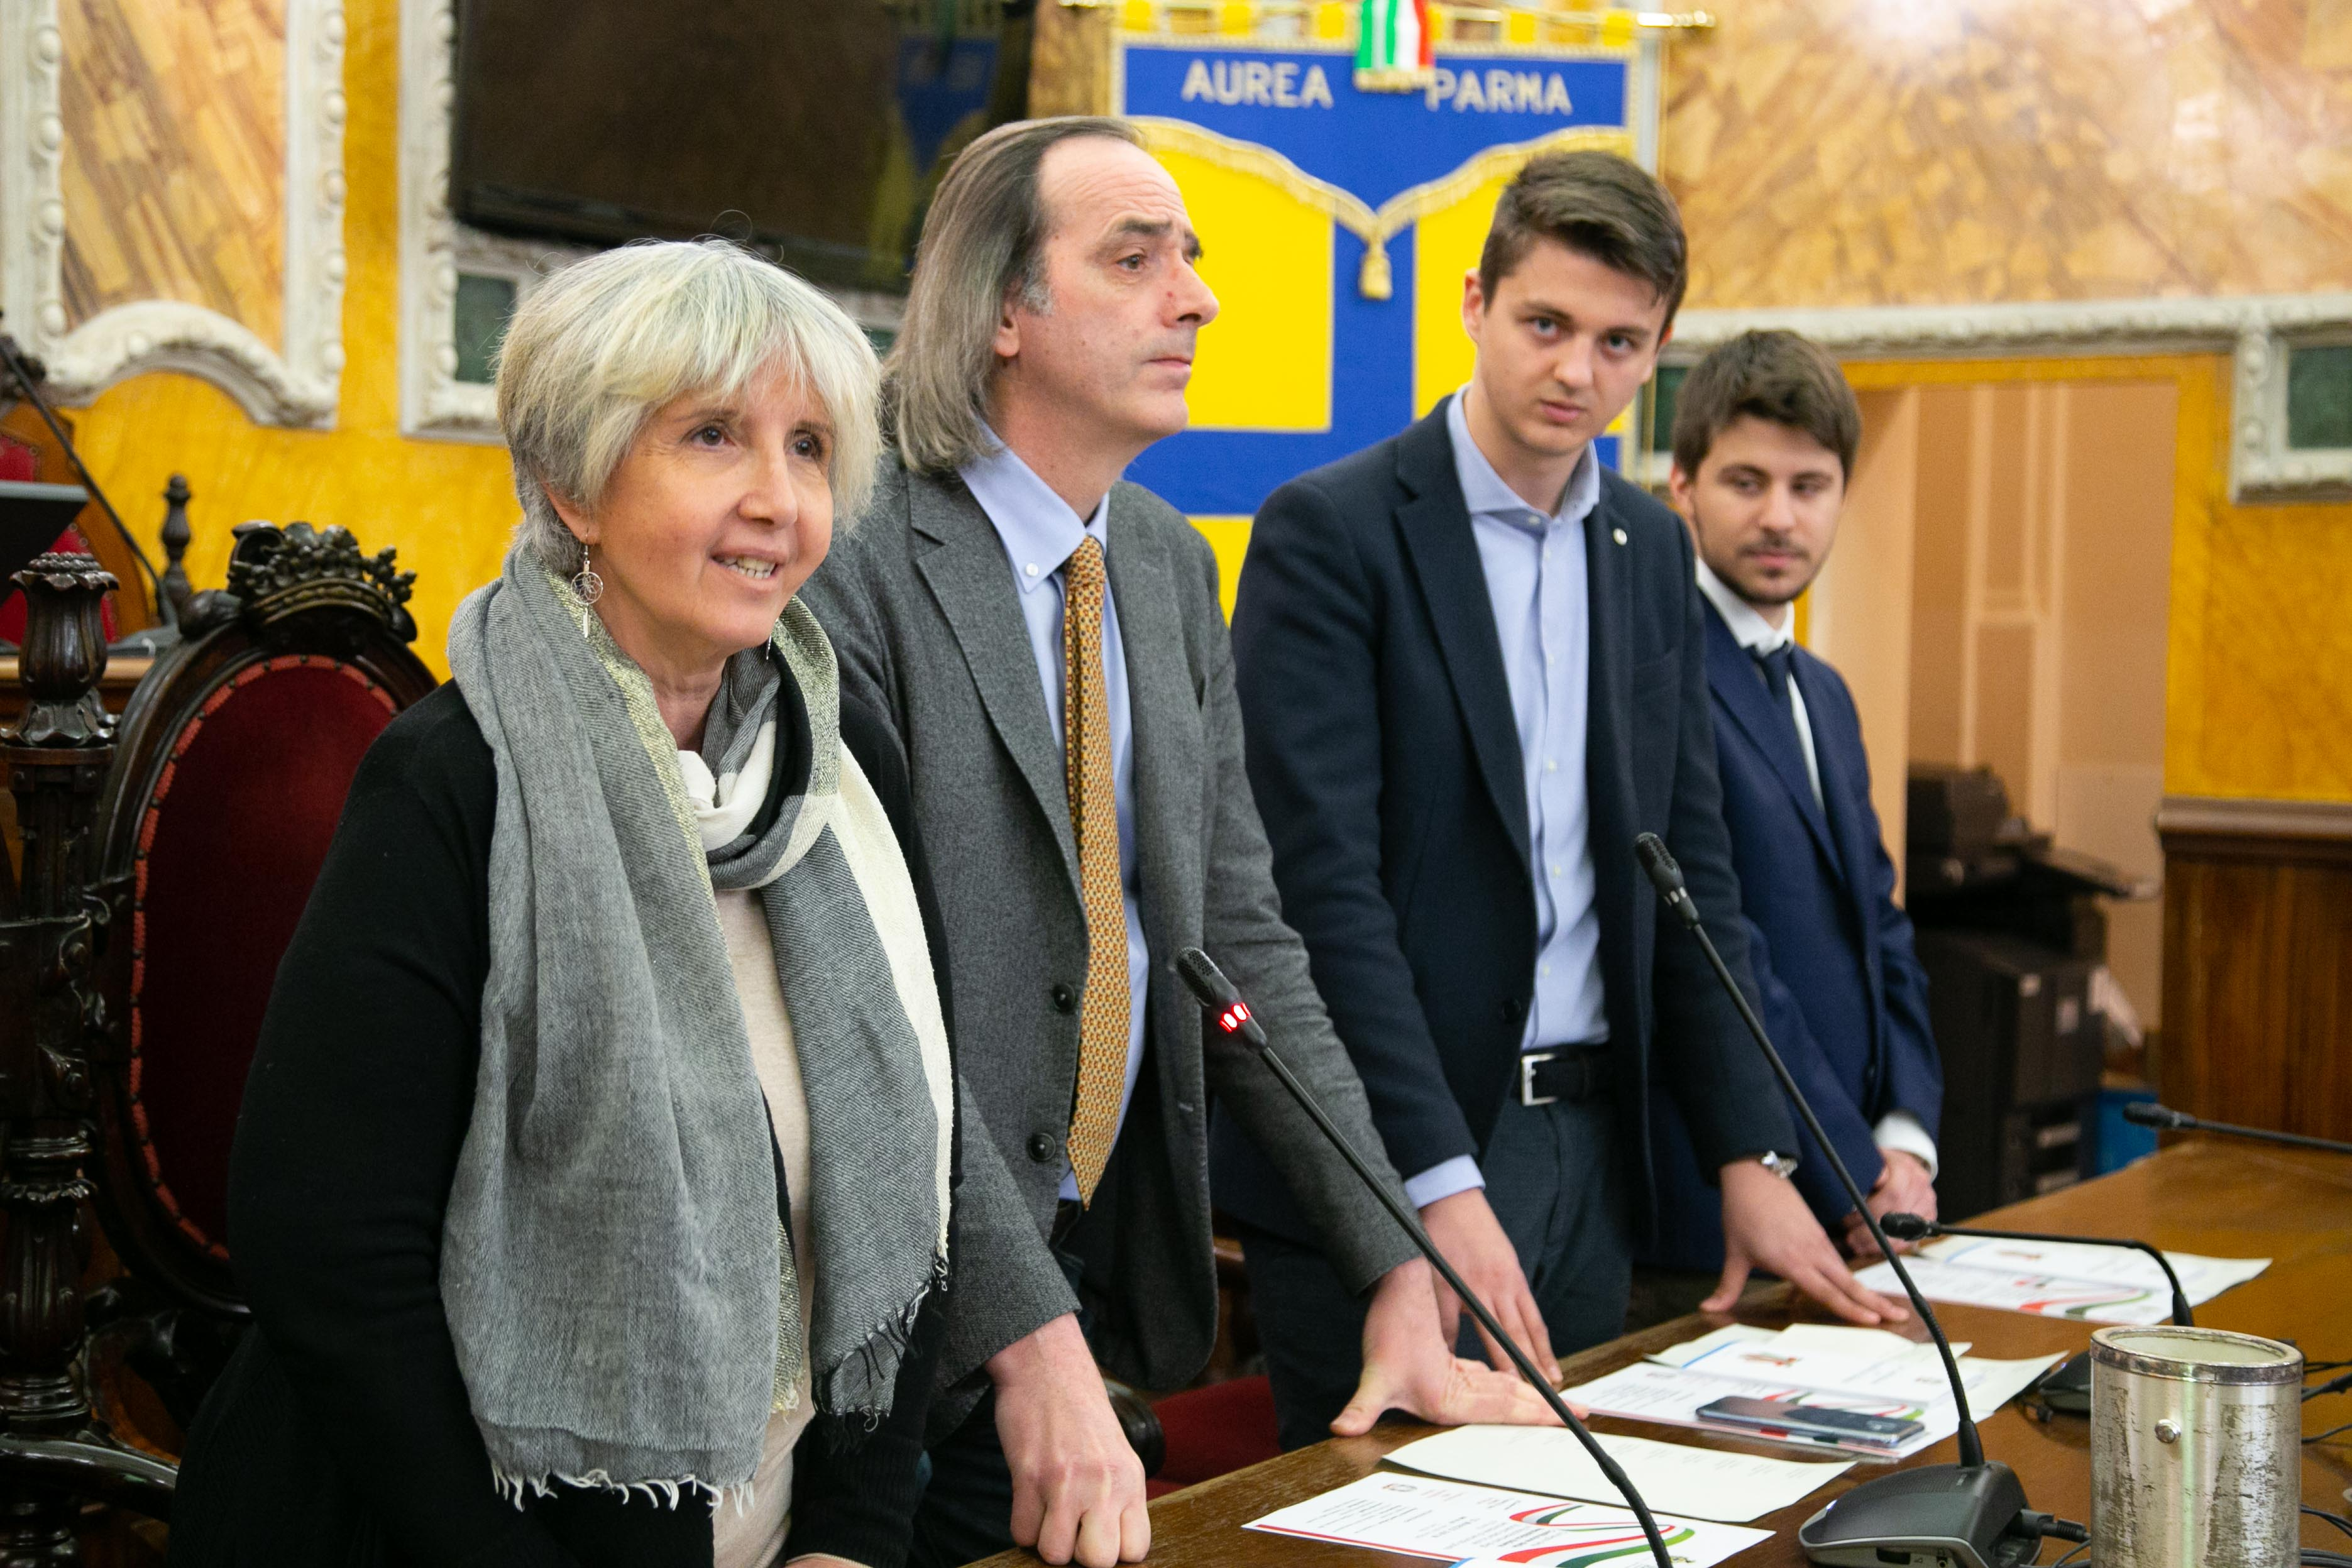 2019 03 13 Paci Tassi-Carboni Spadi consegna Costituzione-3